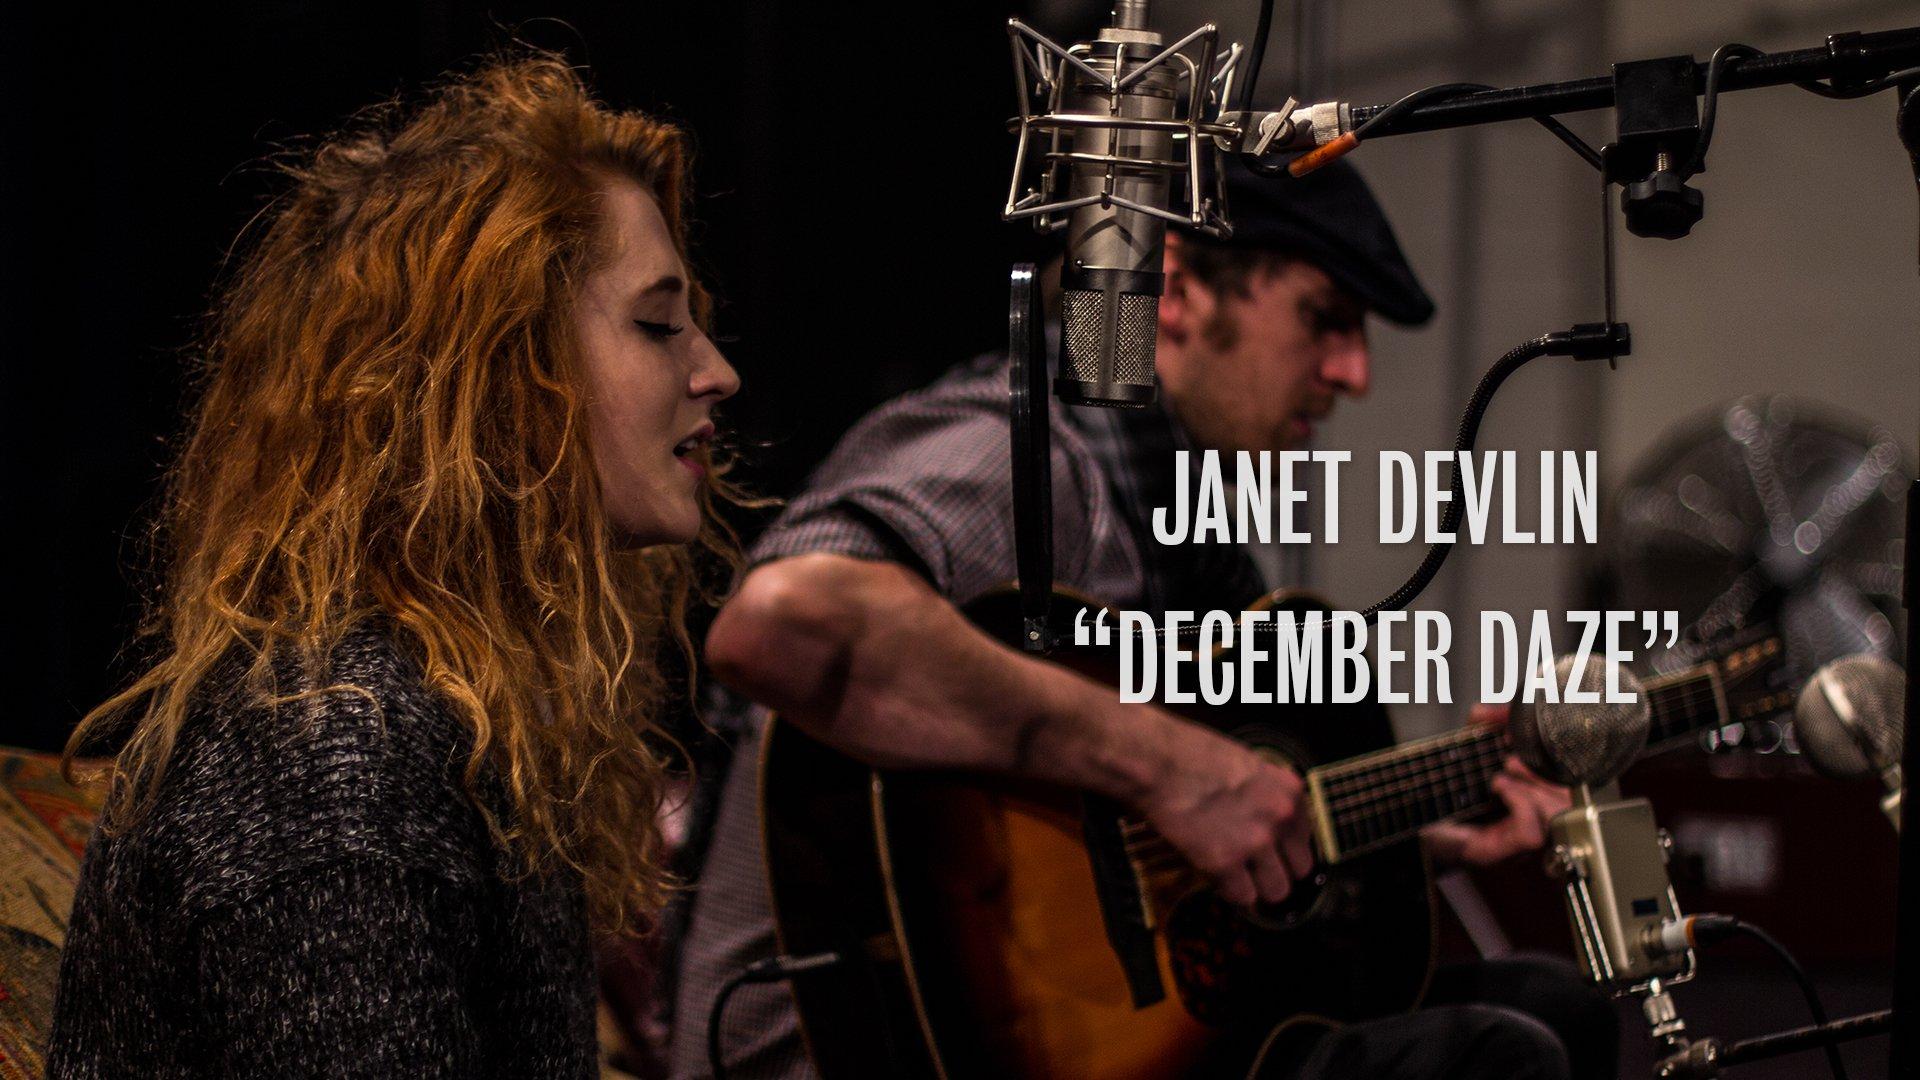 RT @OntSofa: @JanetJealousy with her new track, 'December Daze', live at @sensiblemusic   https://t.co/hq3U0UDUTn https://t.co/D1gkbtwxyF